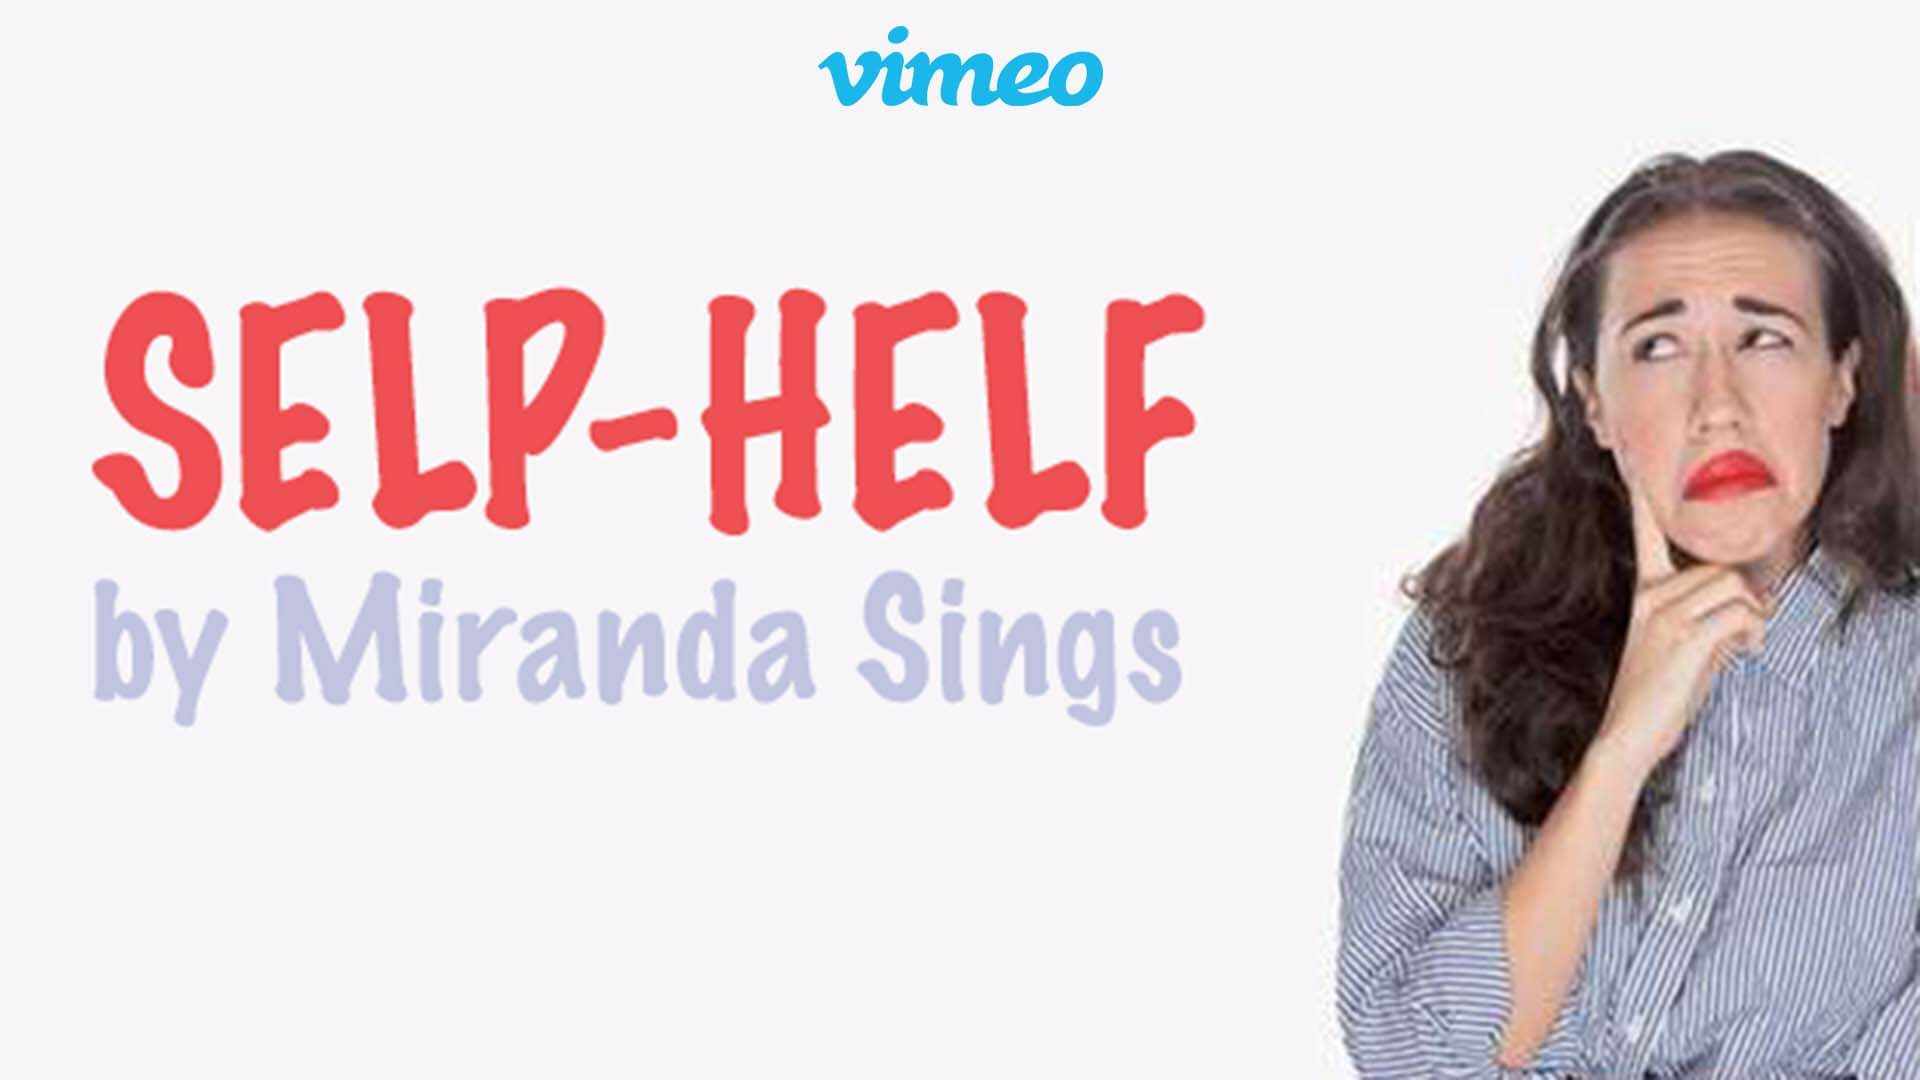 Miranda Sings H